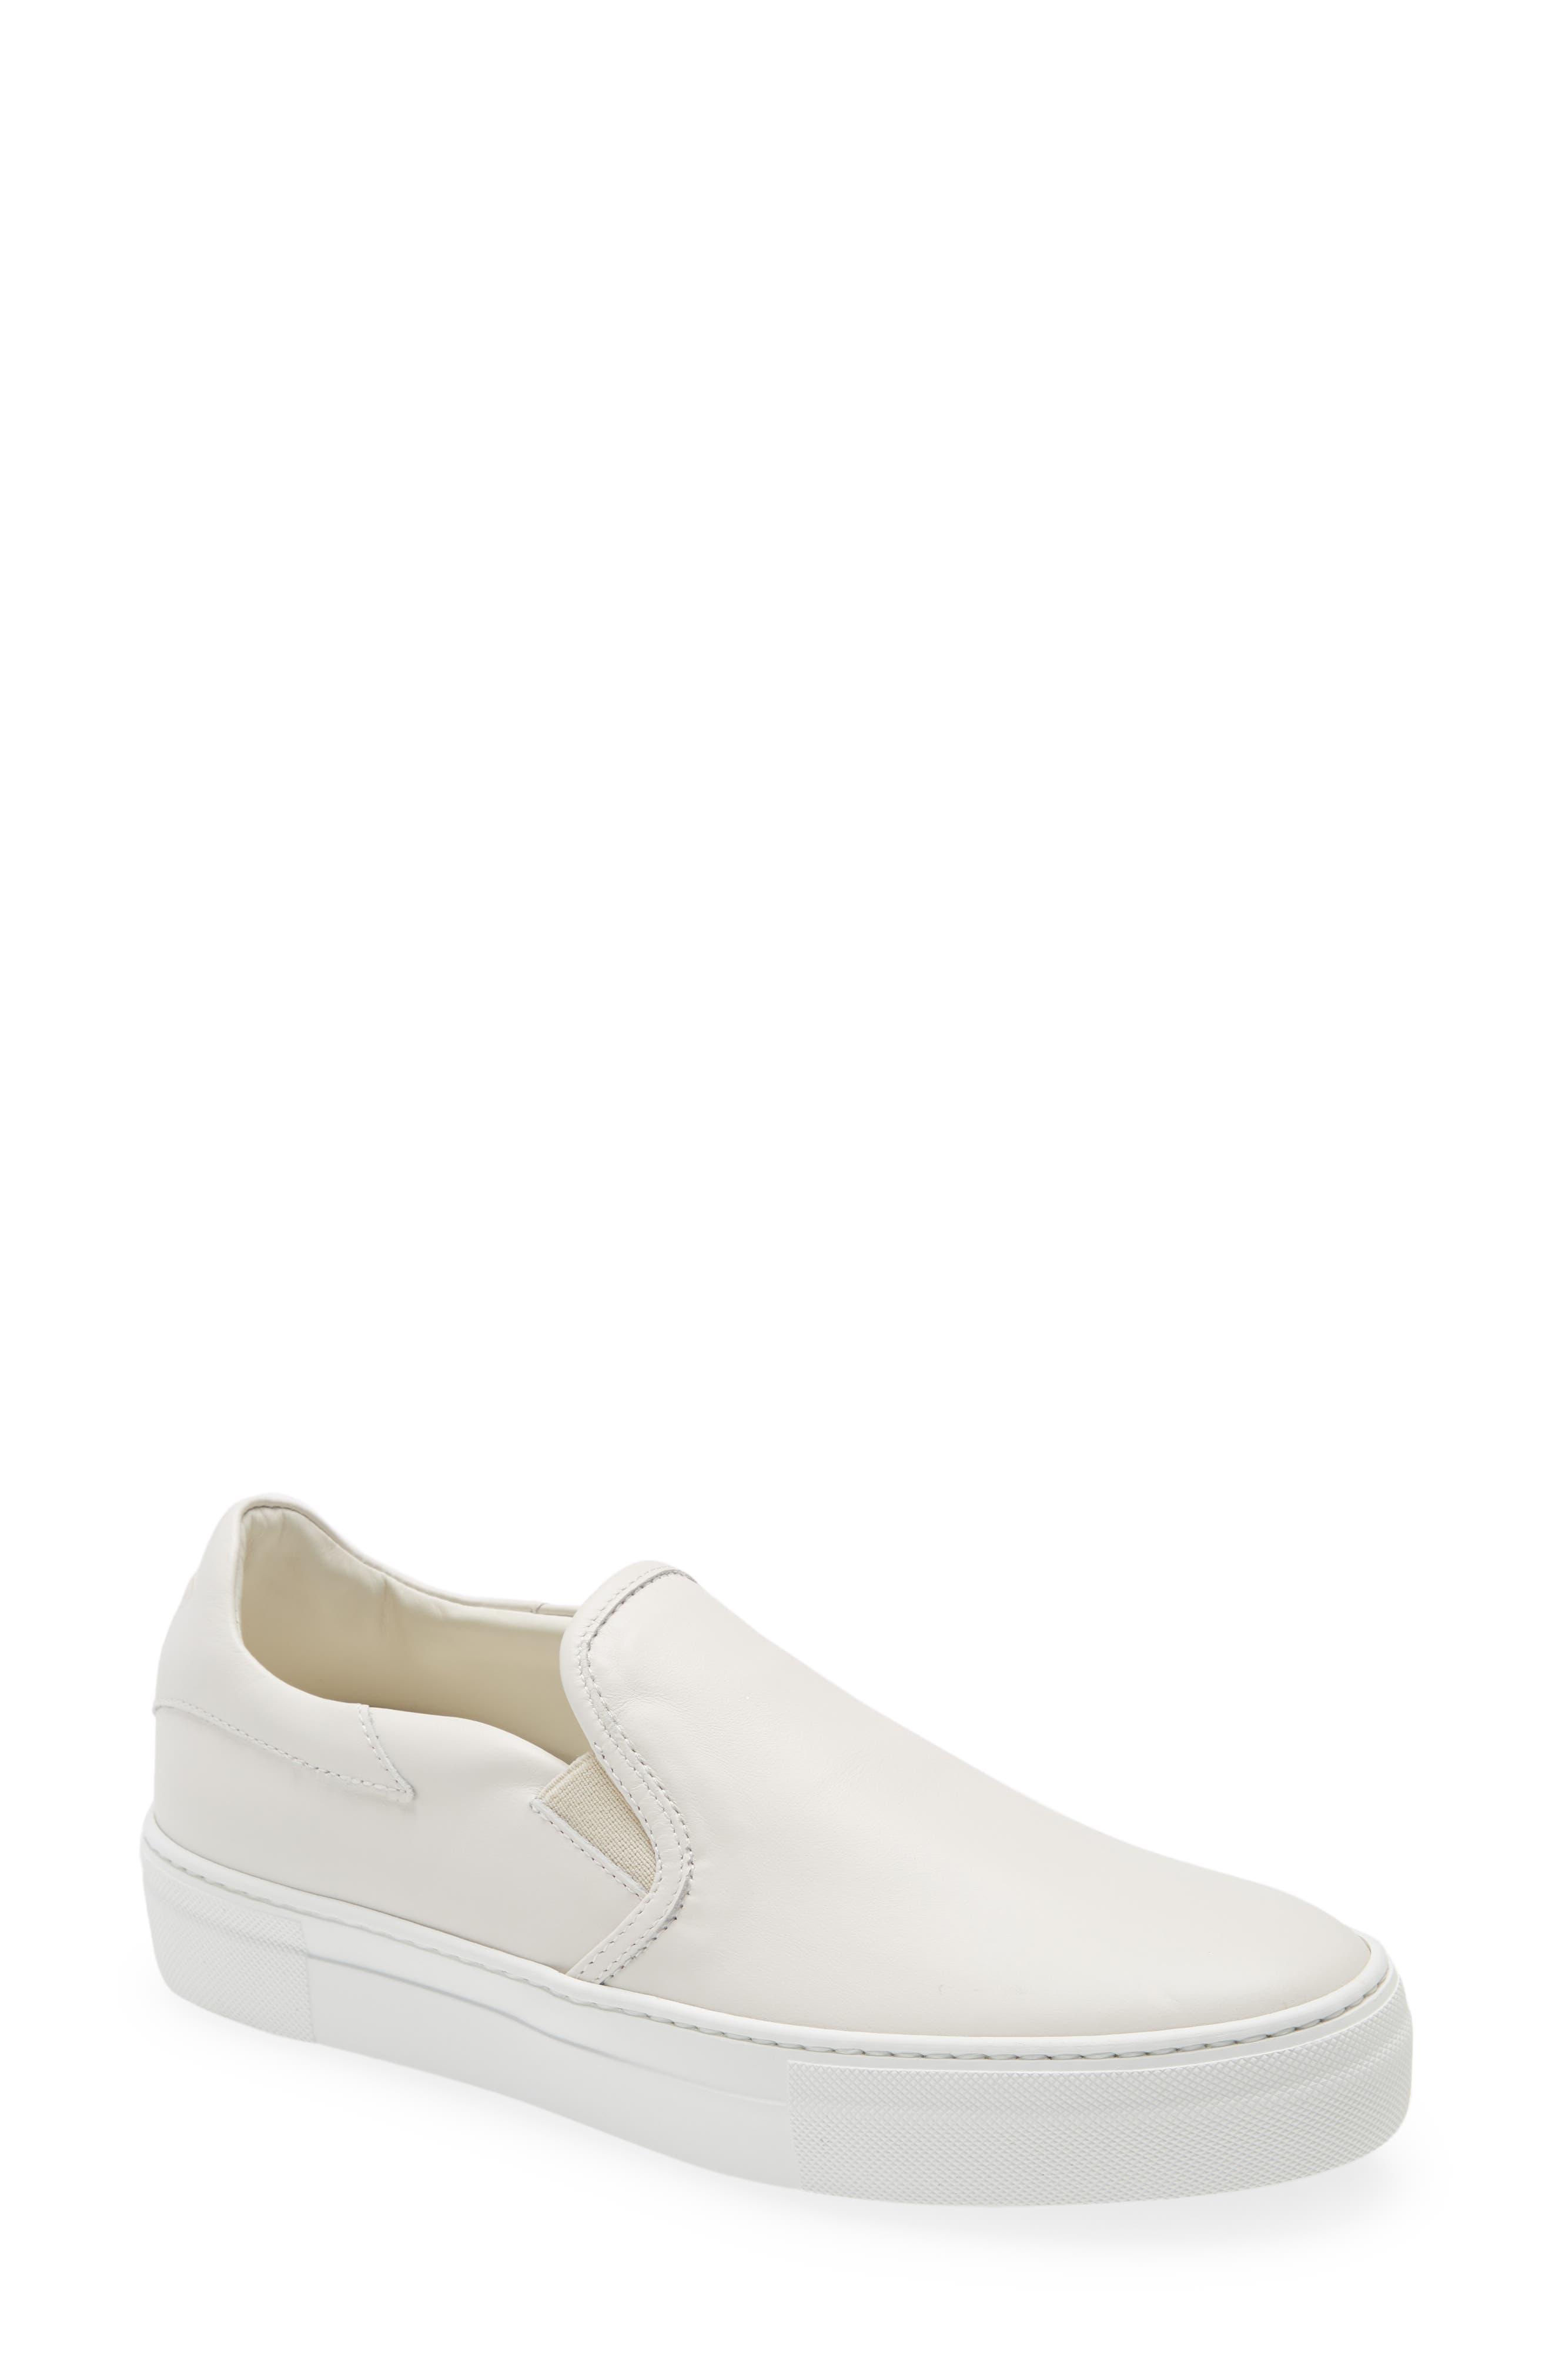 Icon Slip-On Sneaker